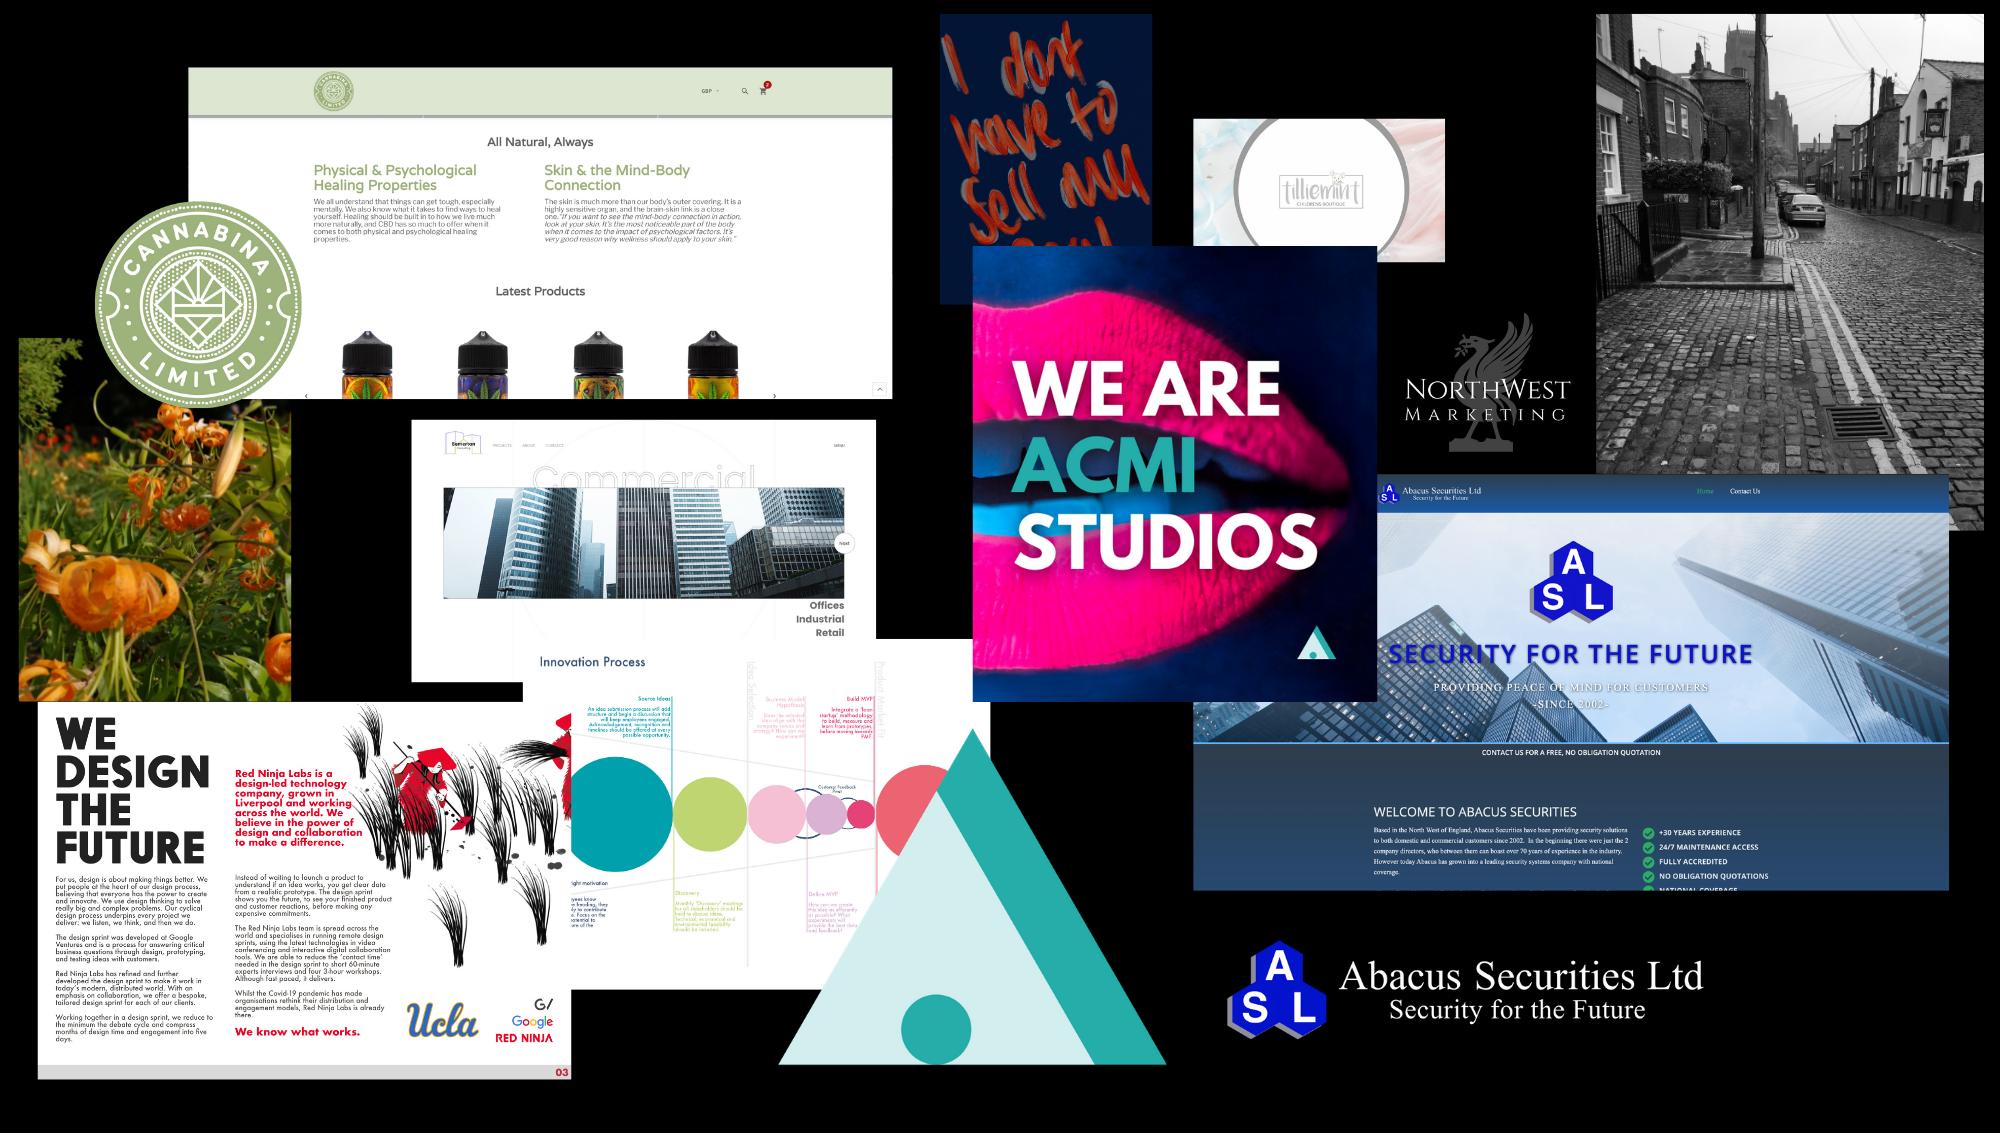 ACMI Studios Web design seo liverpool